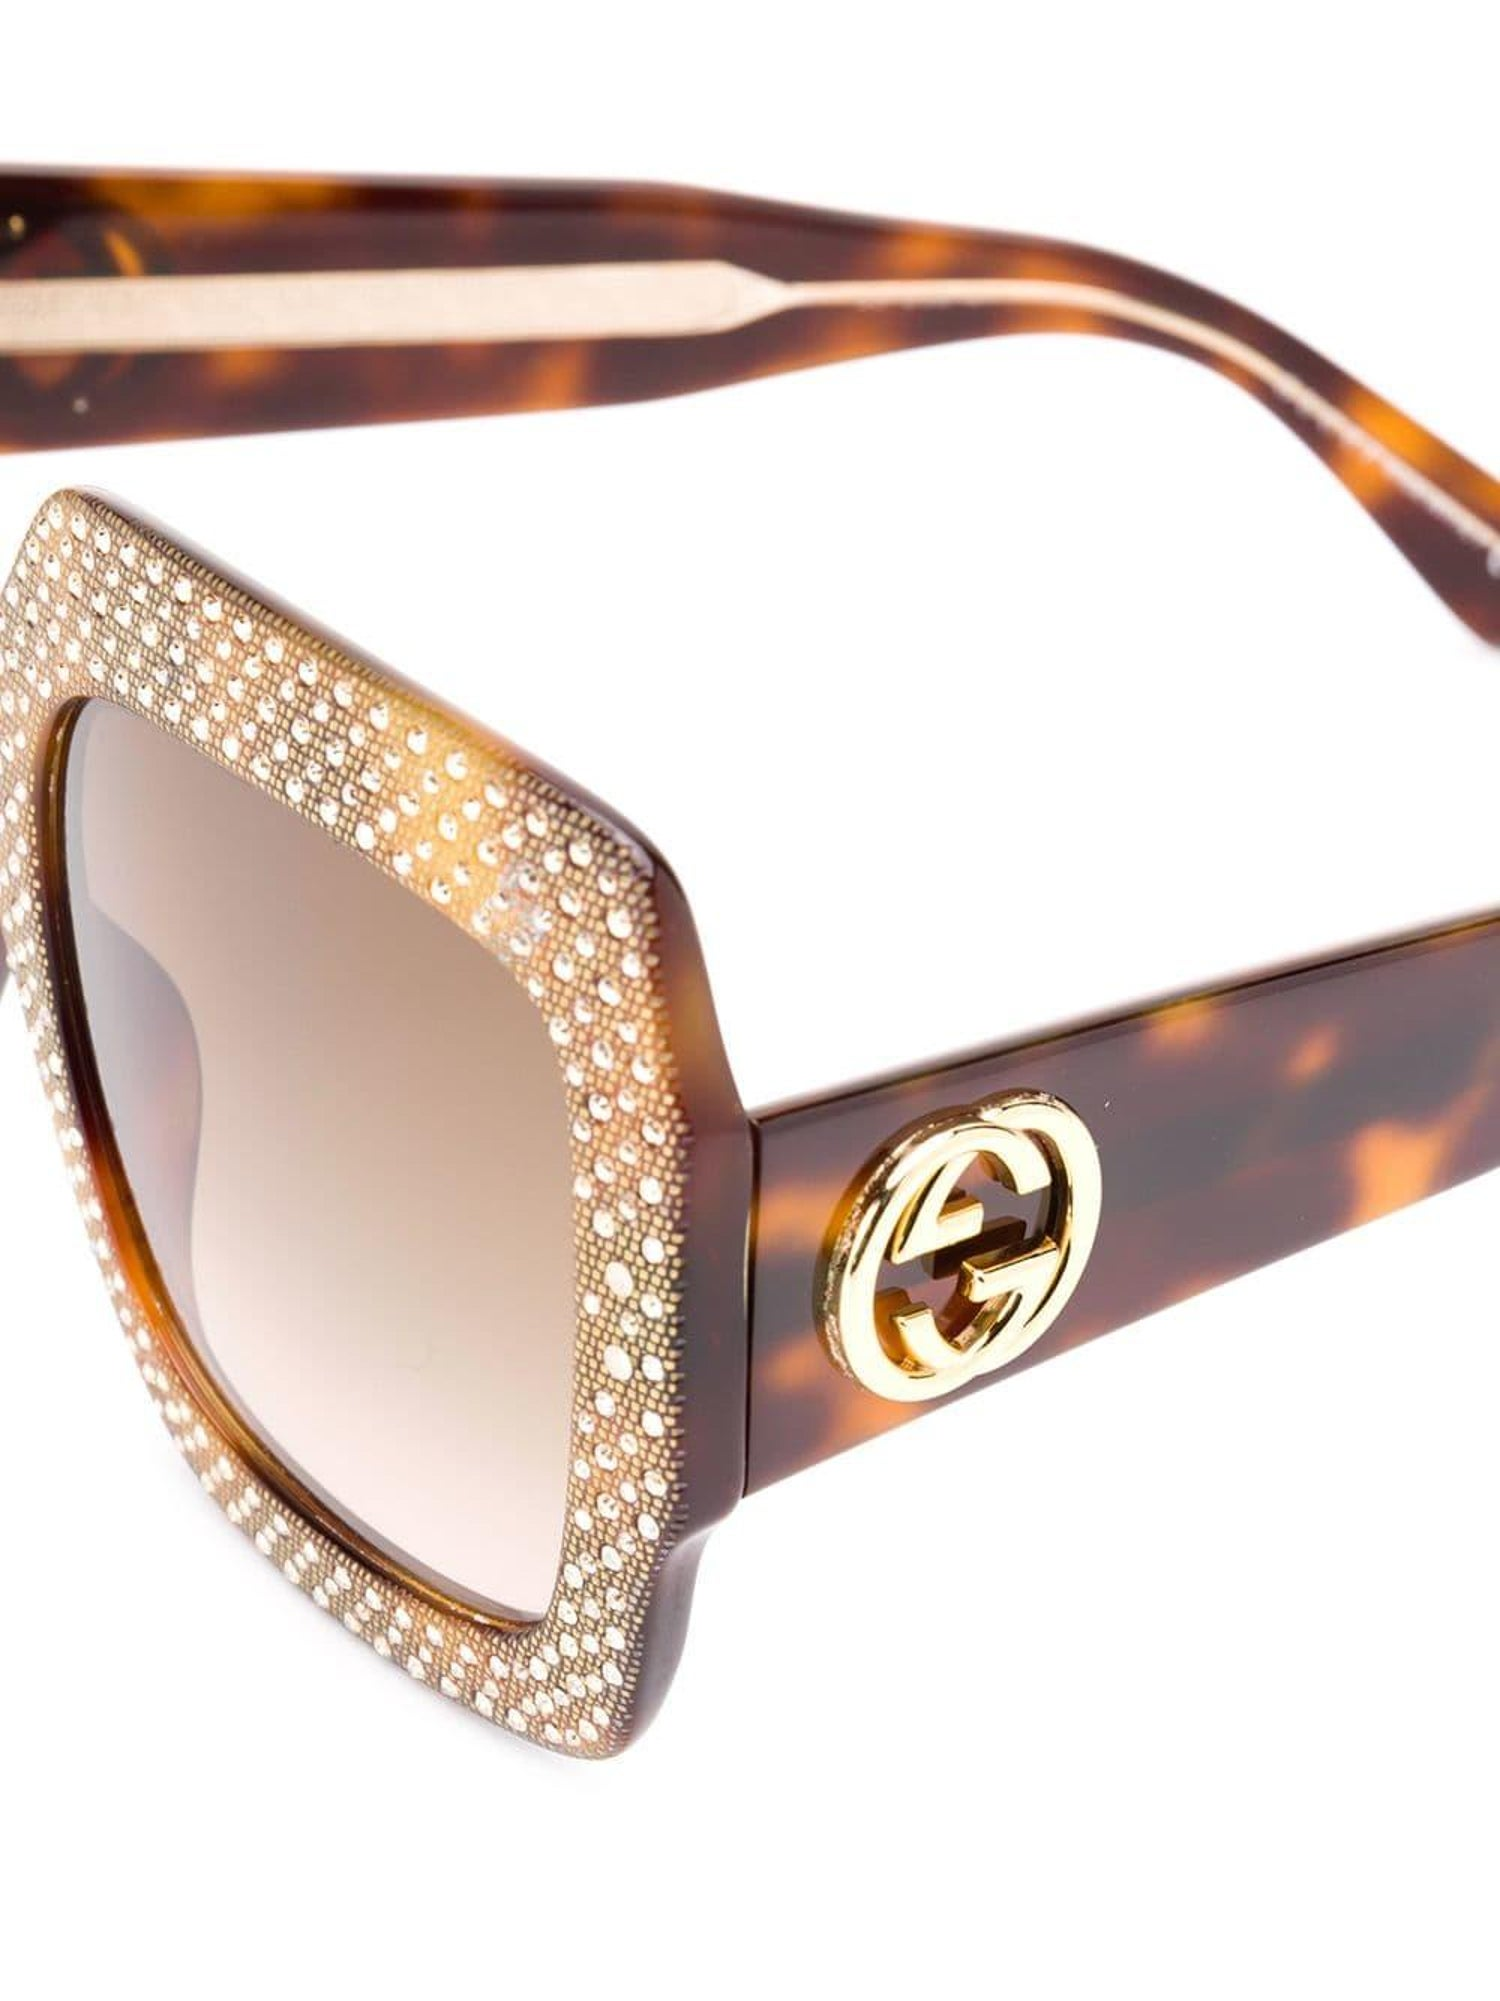 5ab6930654 Gucci Oversized Rhinestone Sunglasses at 1stdibs